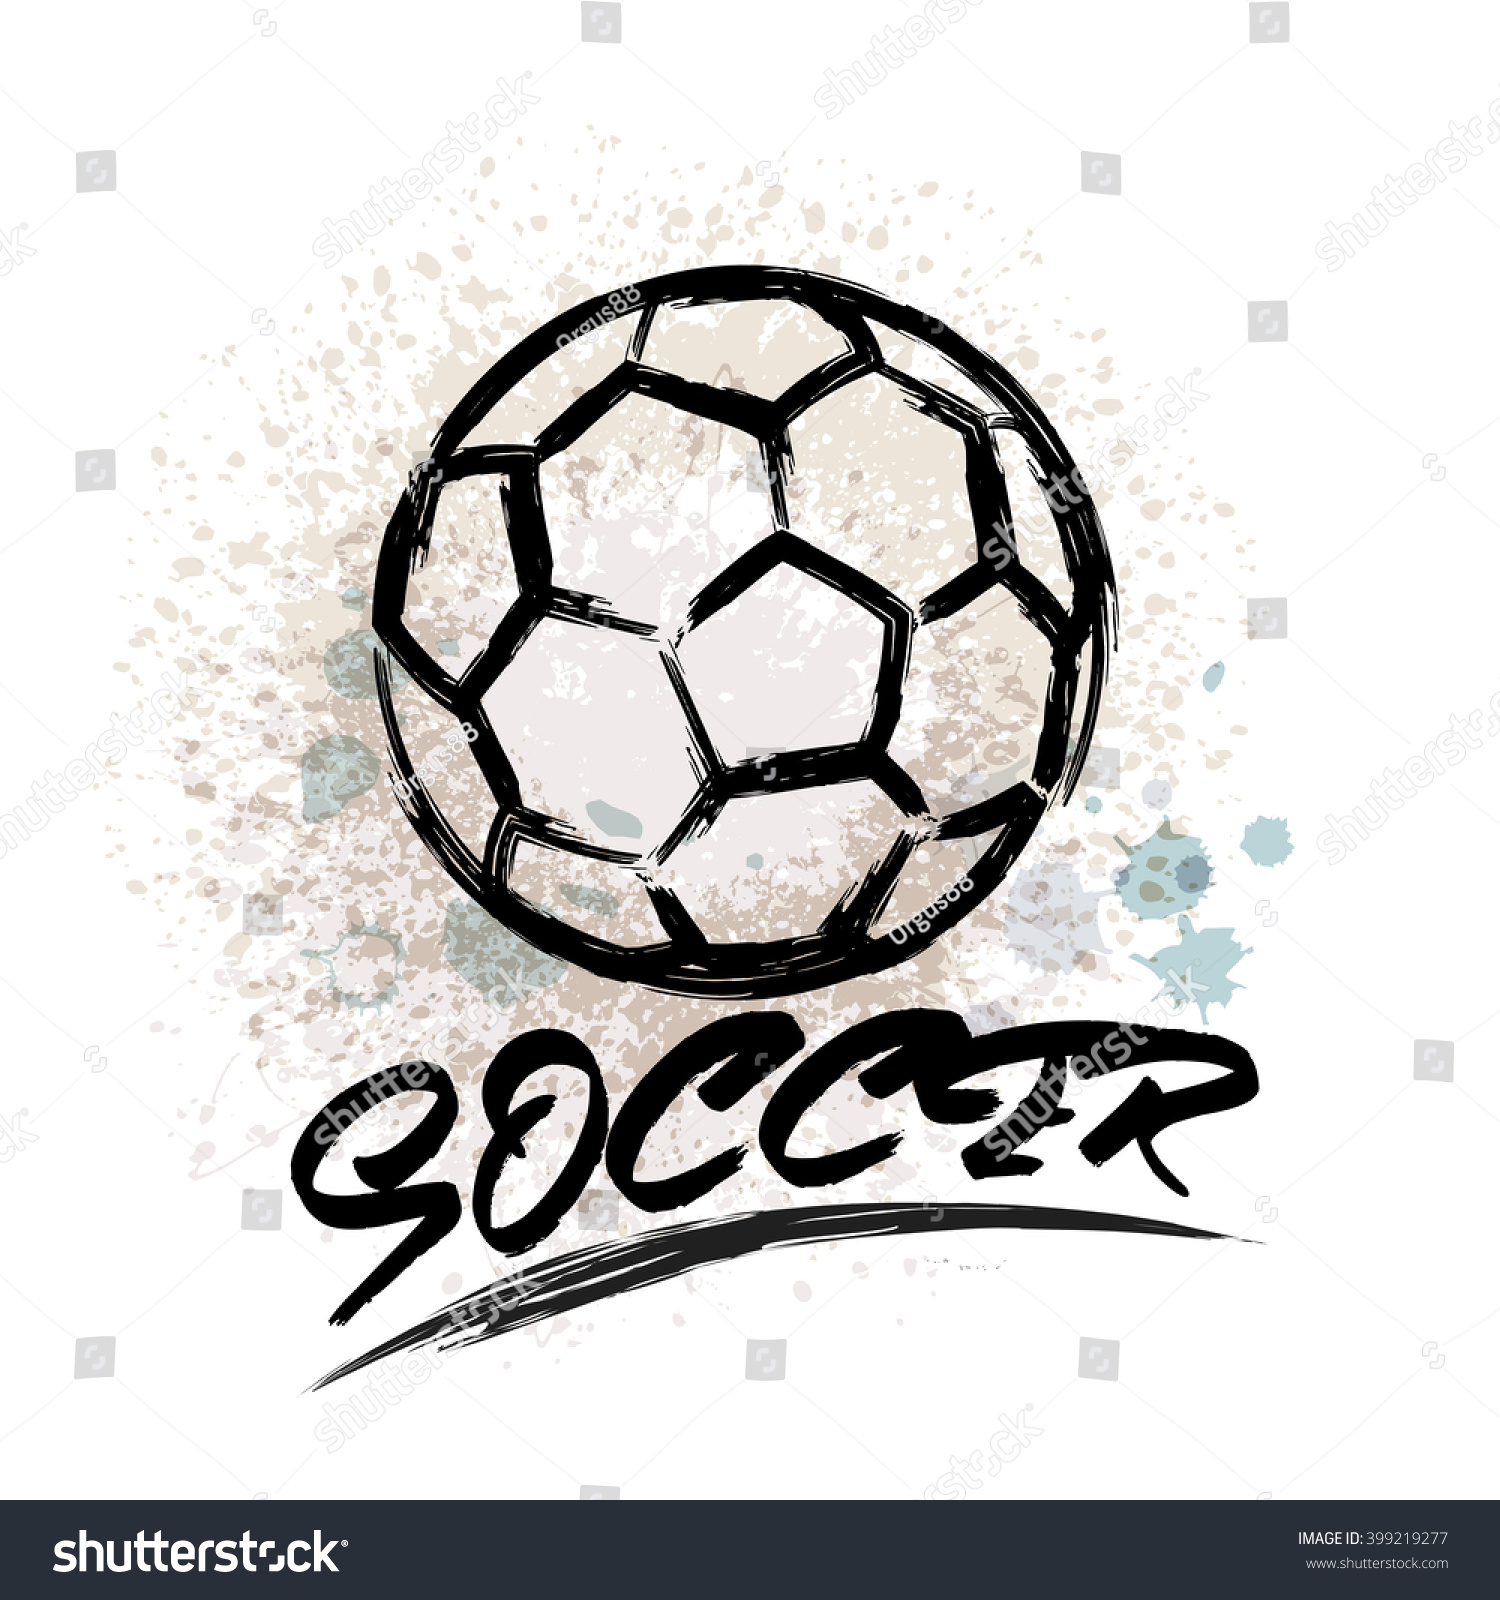 Design t shirt soccer - Vector Grunge Soccer Design T Shirt Poster Banner Backdrops Design